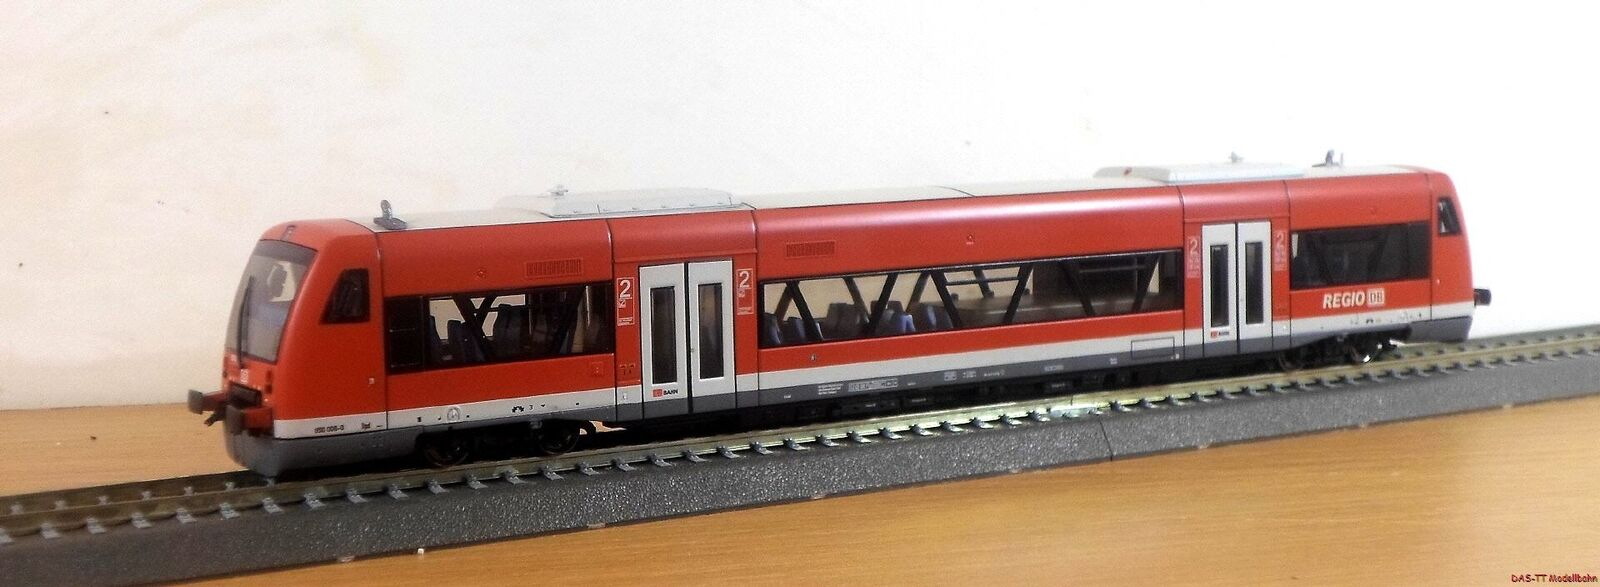 TT Regio Shuttle br650 (rs1) DB Regio Regio Regio verkehrsrosso EP. V 33510 audace 7874c9